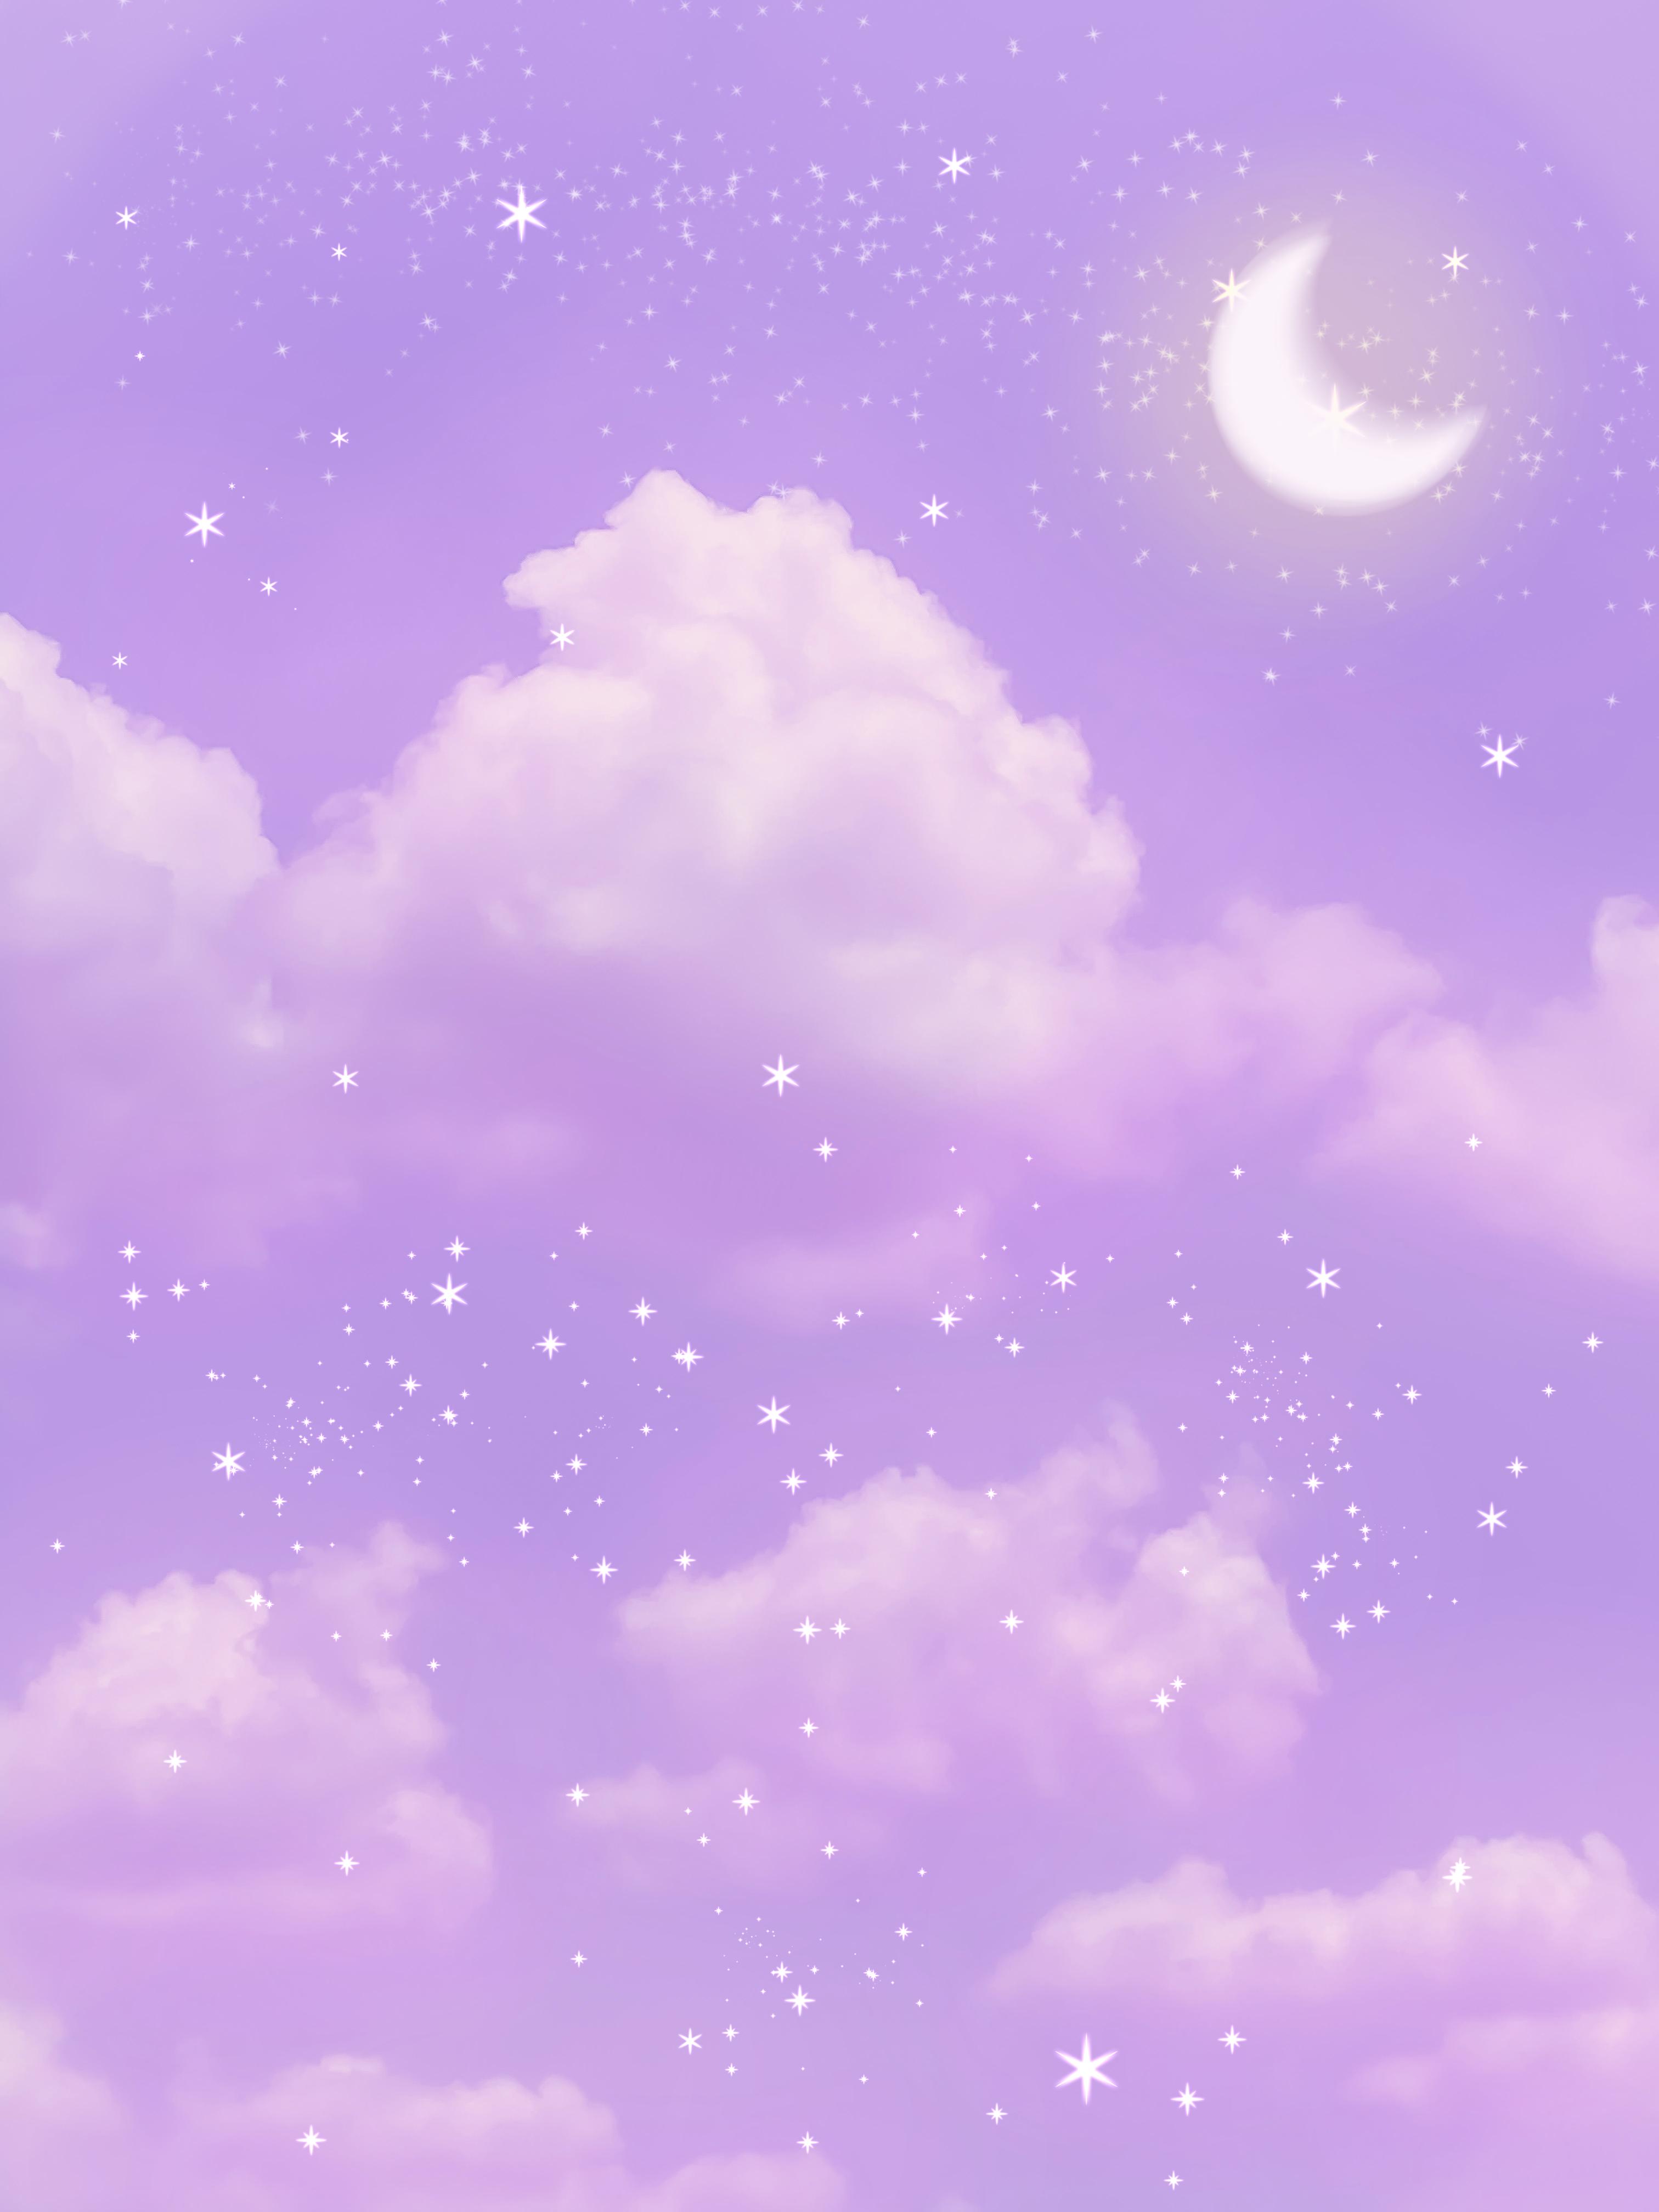 Aesthetic Purple Sky Fond D Ecran Violet Iphone Fond D Ecran Dessin Esthetique Pourpre